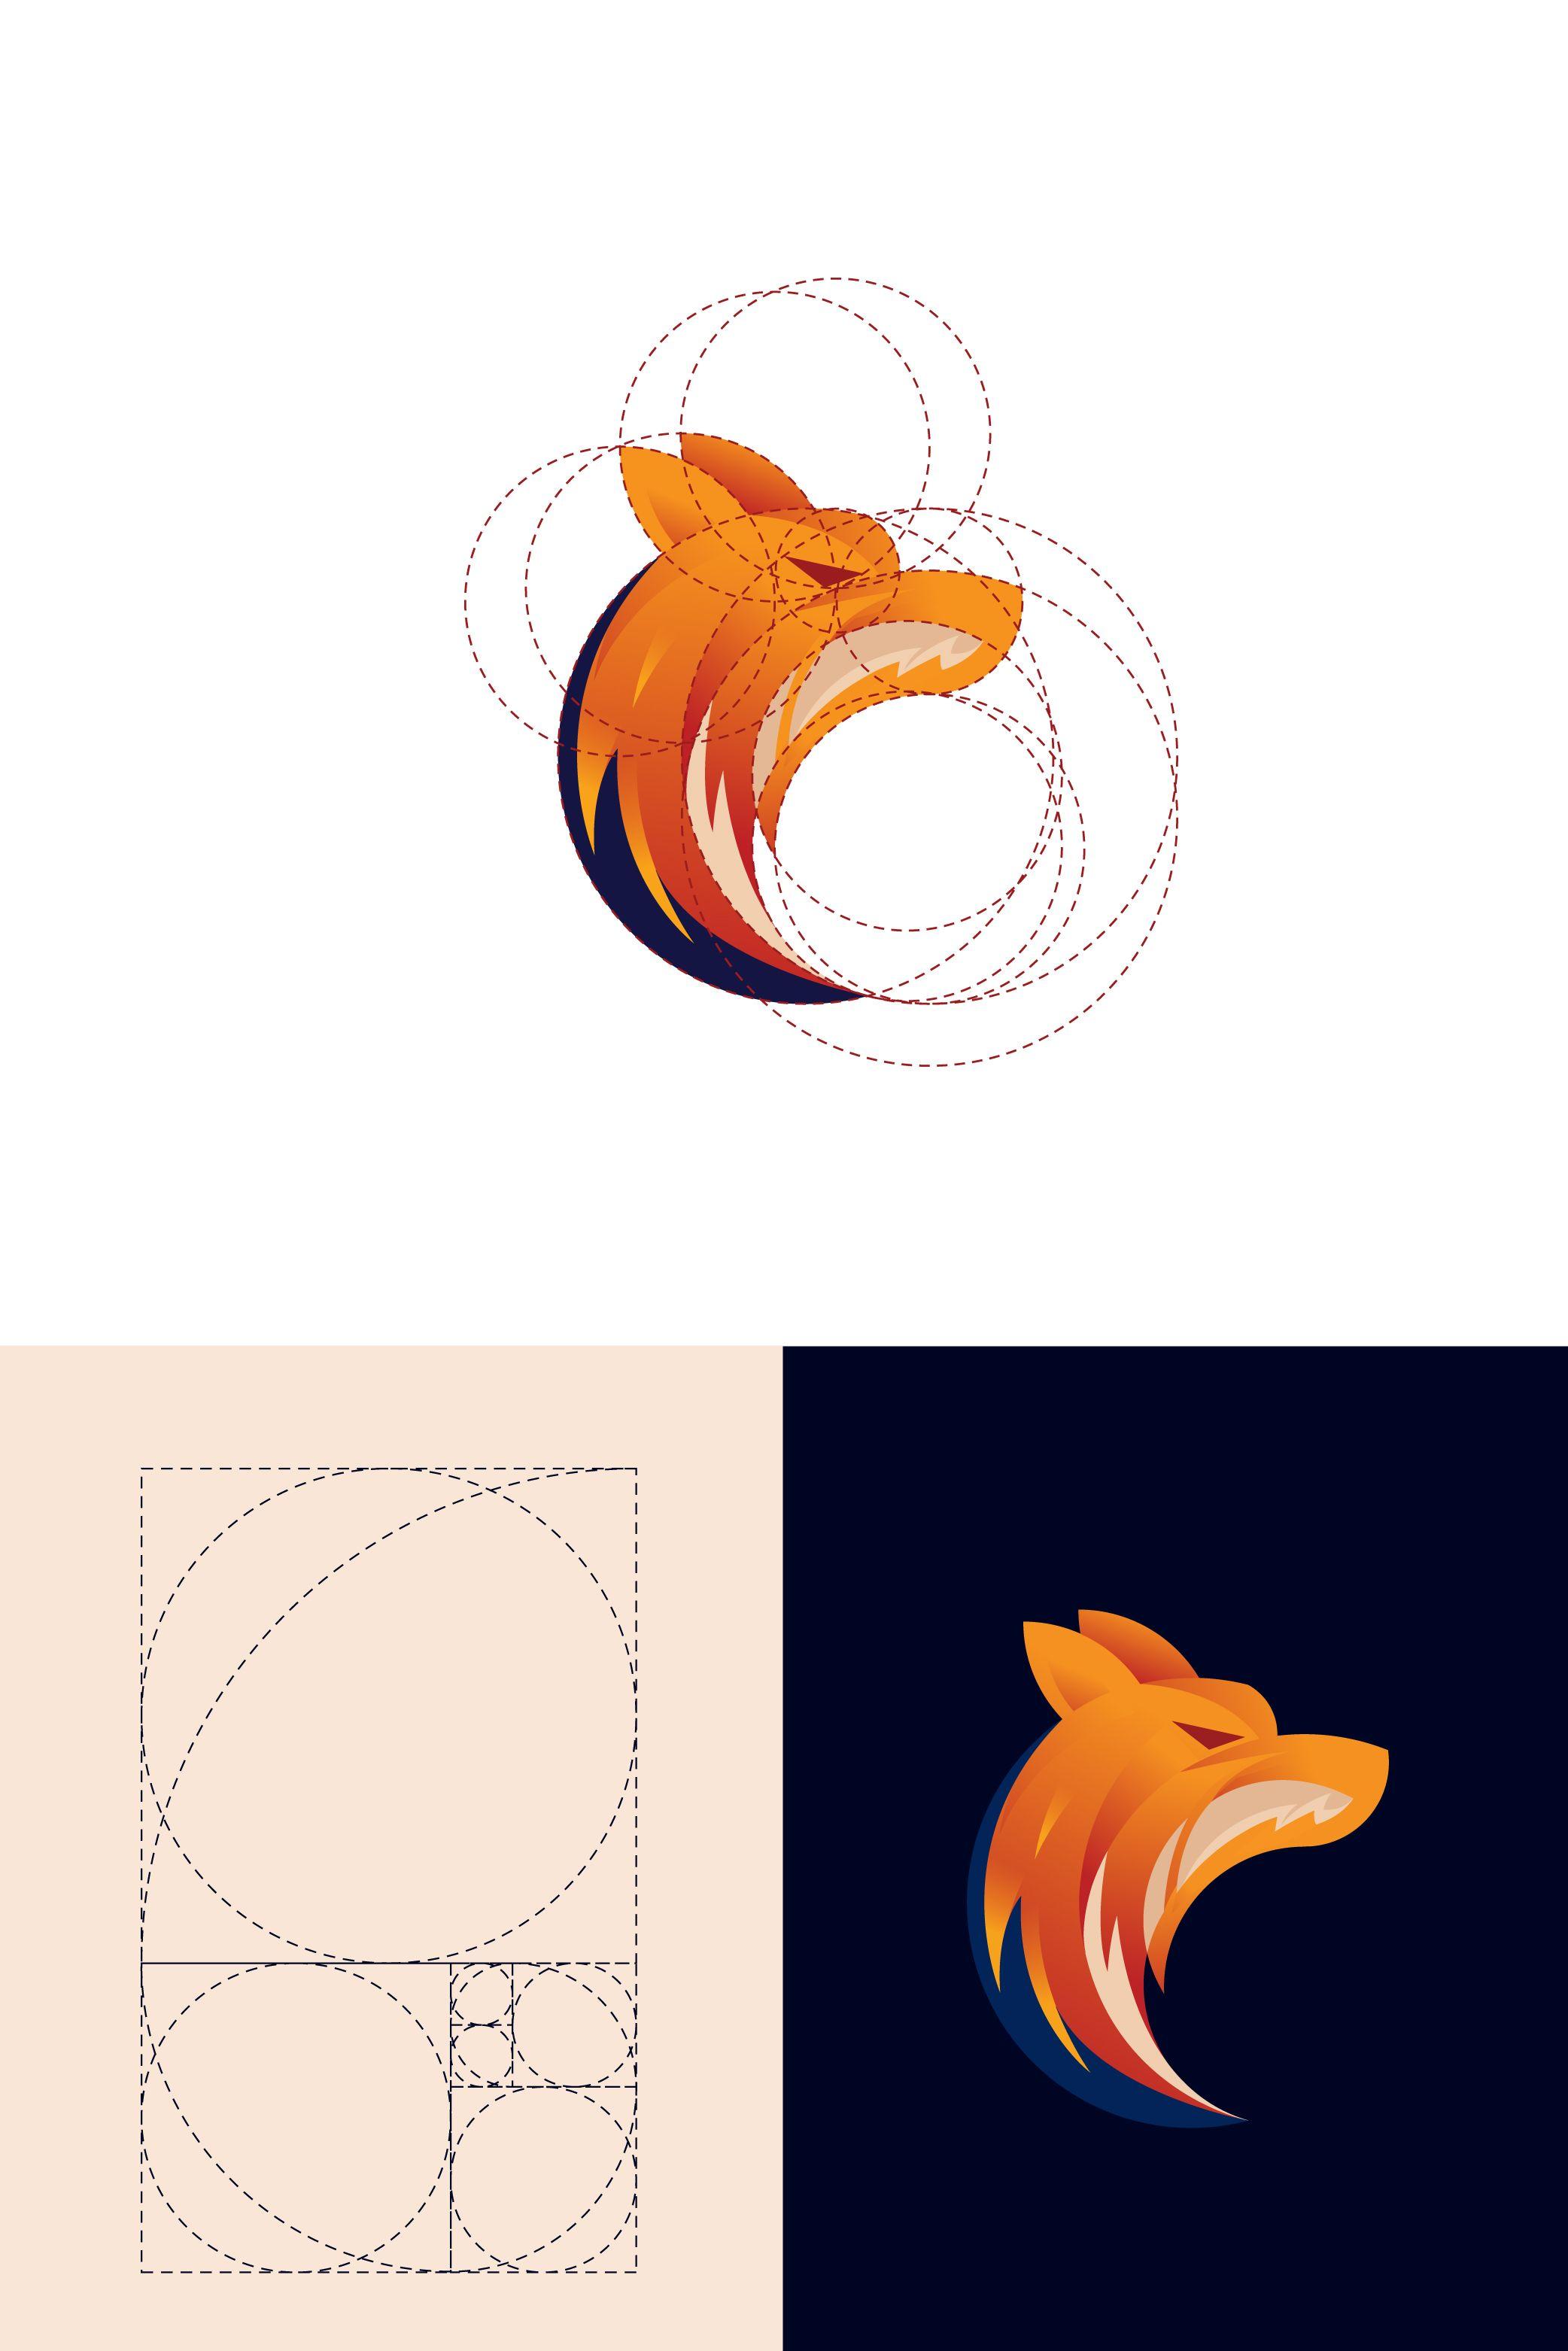 Fox logo design based on golden ratio. A tutorial i make